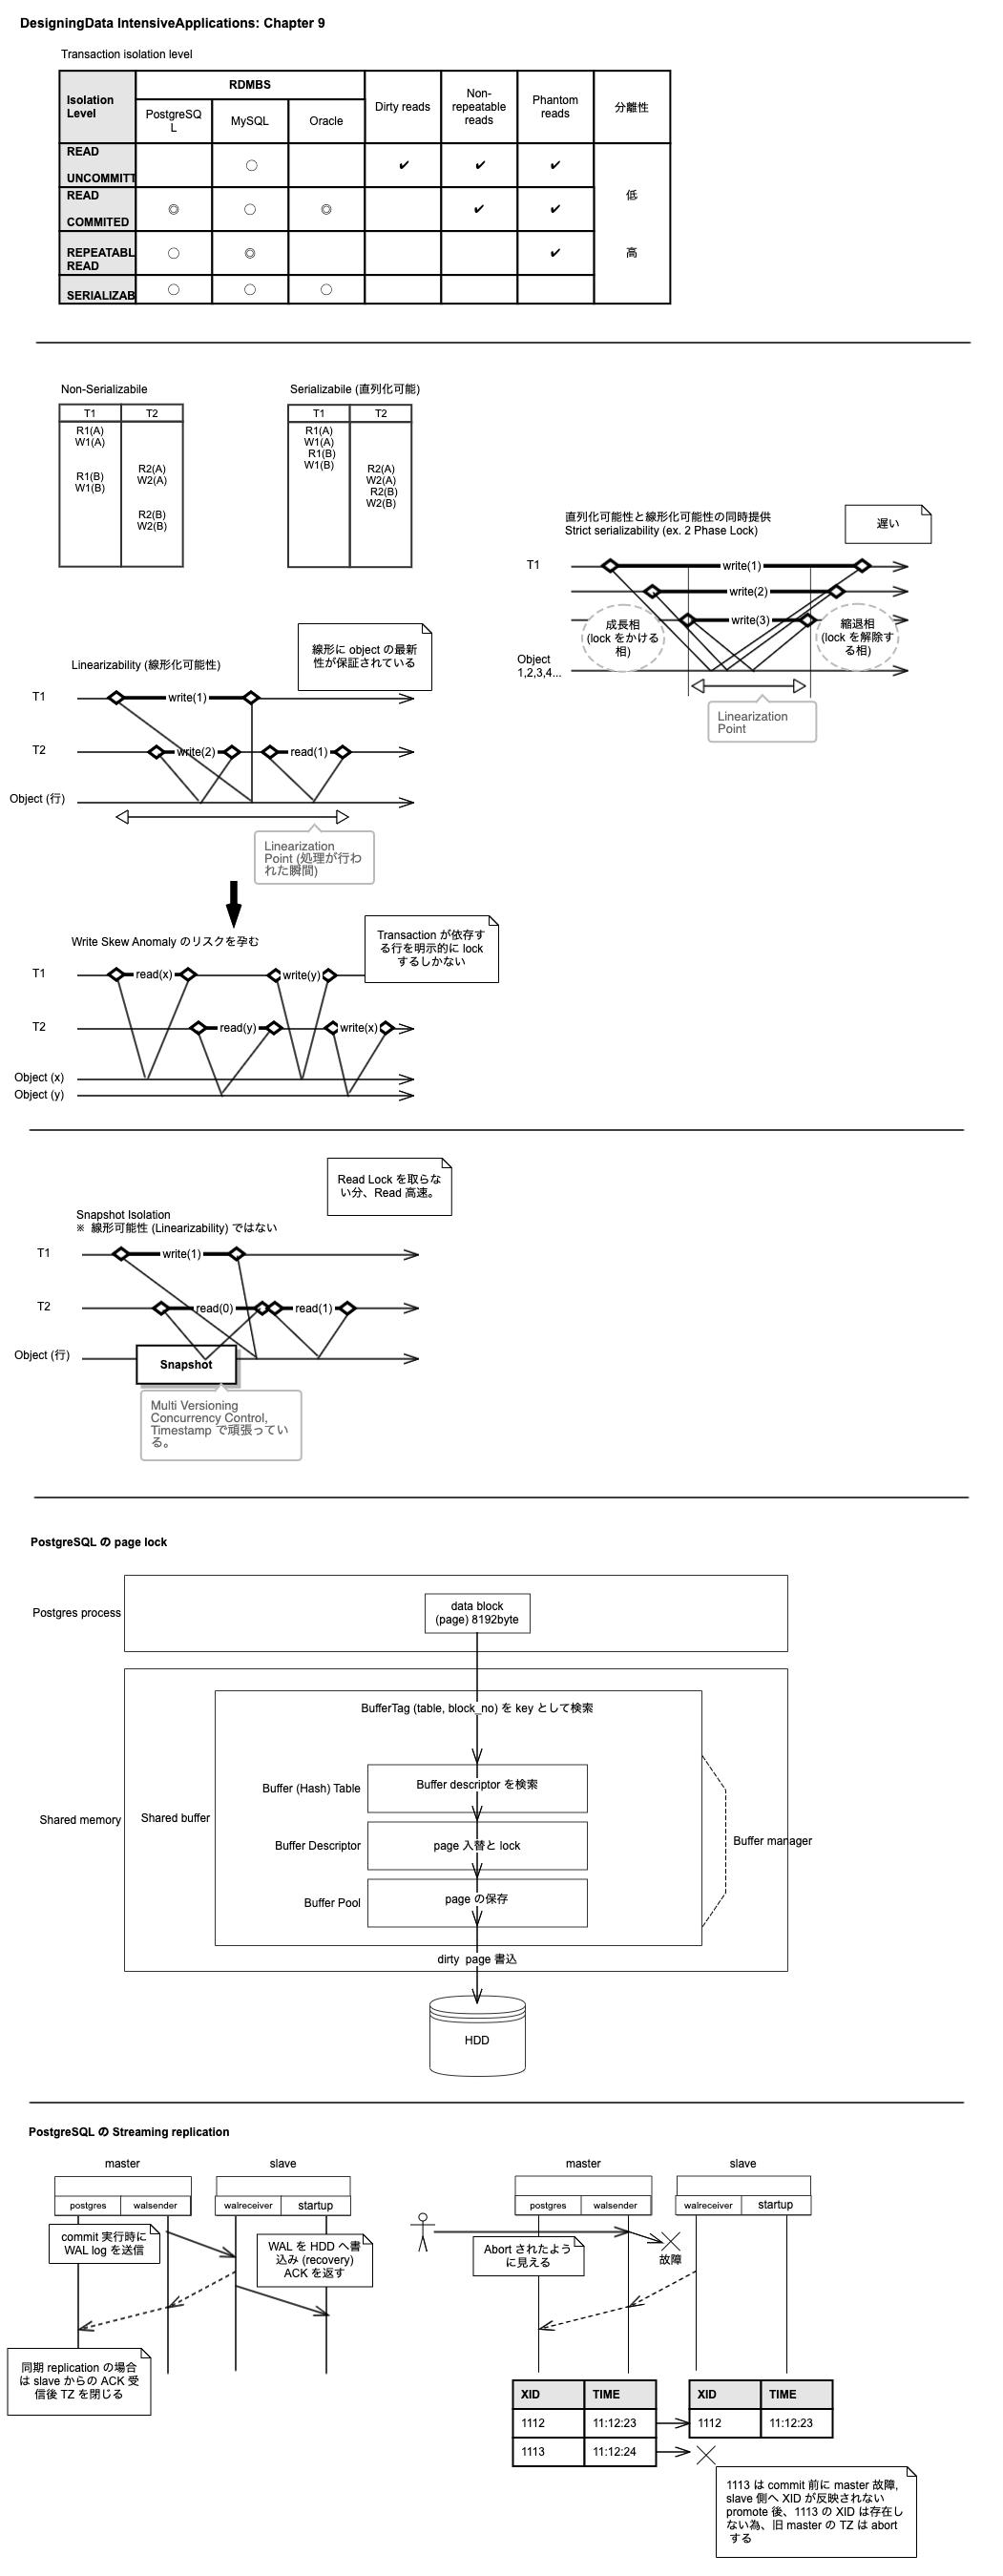 study-meeting_DesigningData-IntensiveApplications